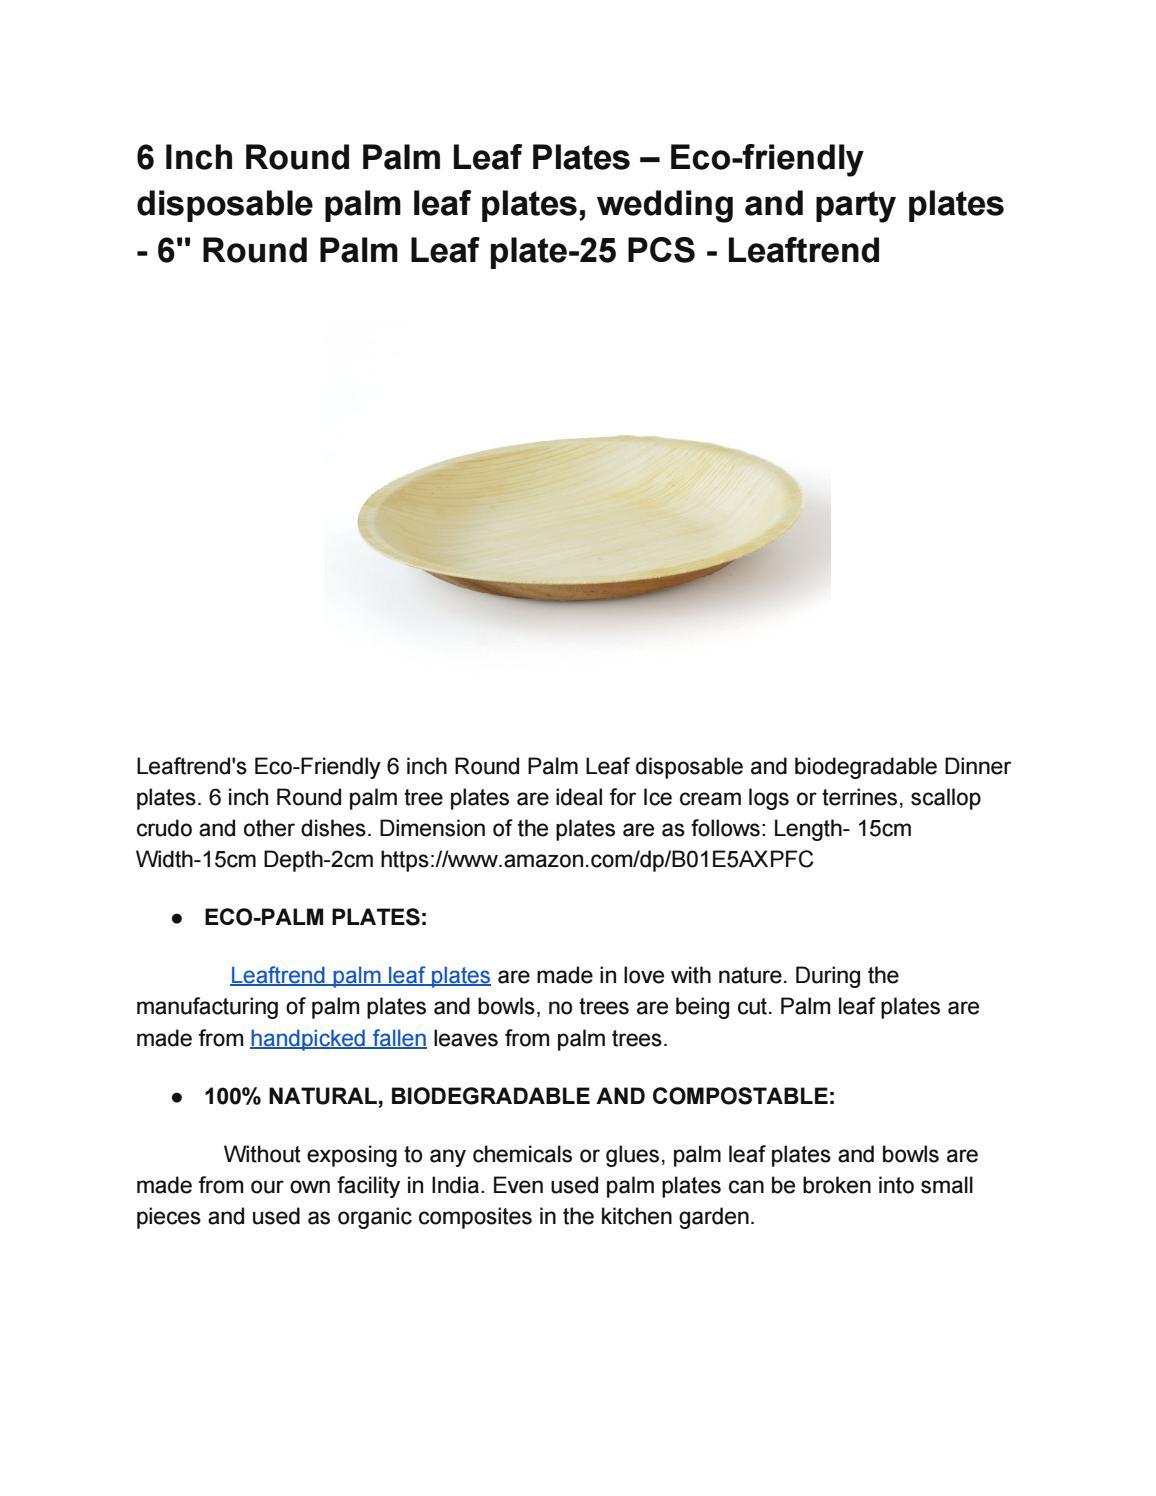 6 Inch Round Plam Leaf Plates – Ecofriendly disposable palm